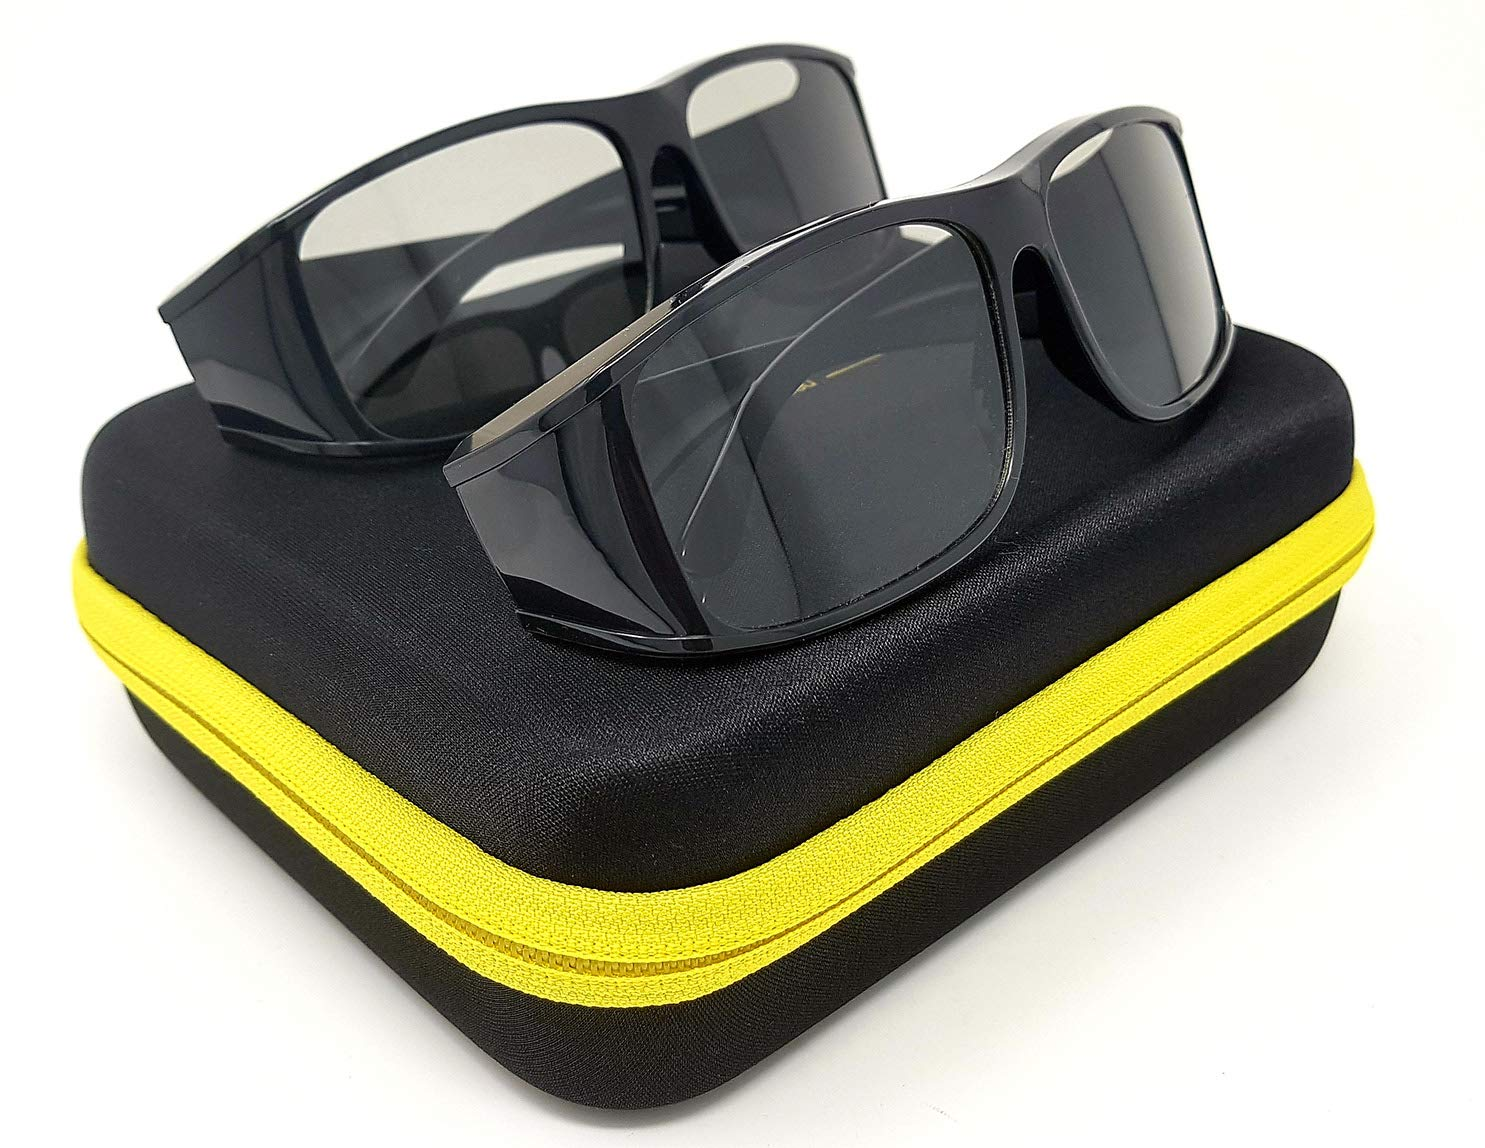 TALLA 2x «passiv 3D Gafas». Hi-SHOCK® 2 pares universal pasivo 3D gafas para todos pasivo 4k 3D TVs & RealD Cine películas. alta calidad polarizada gafas para Sony®, LG®, Hisense®, Grundig®, Pansonic®, Philips®, Toshiba® televisión.